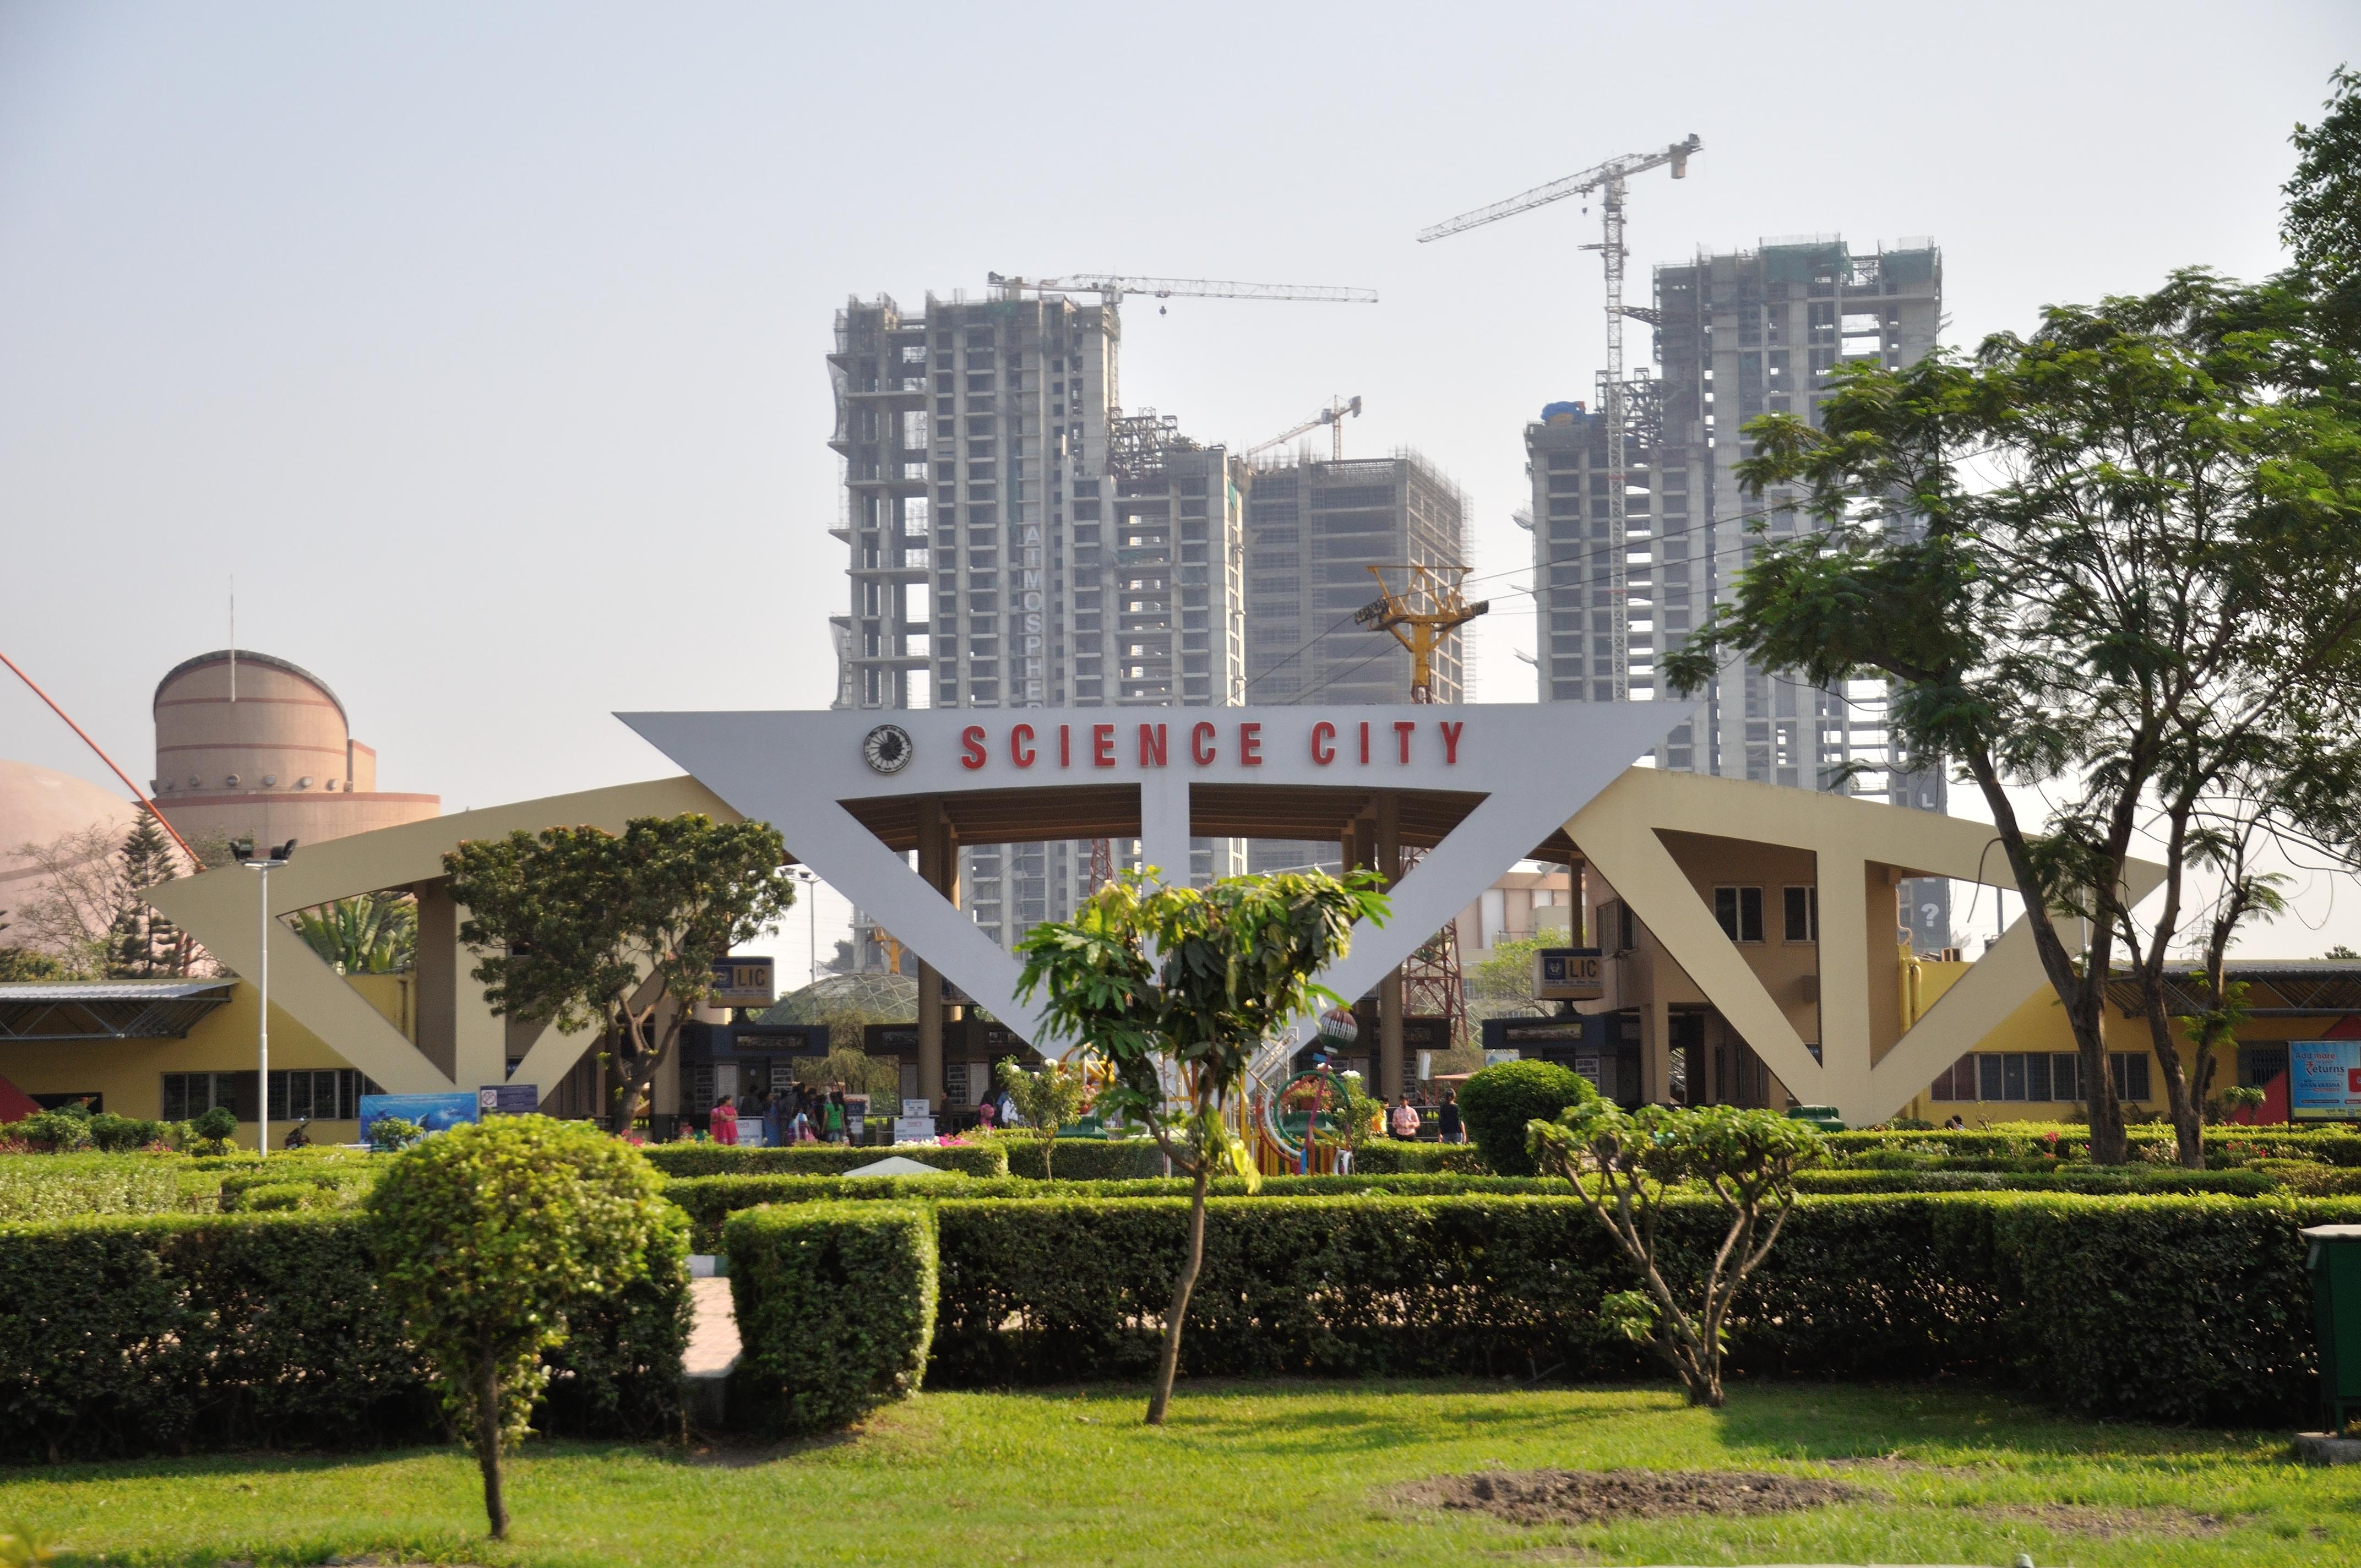 science city science city - HD4288×2848